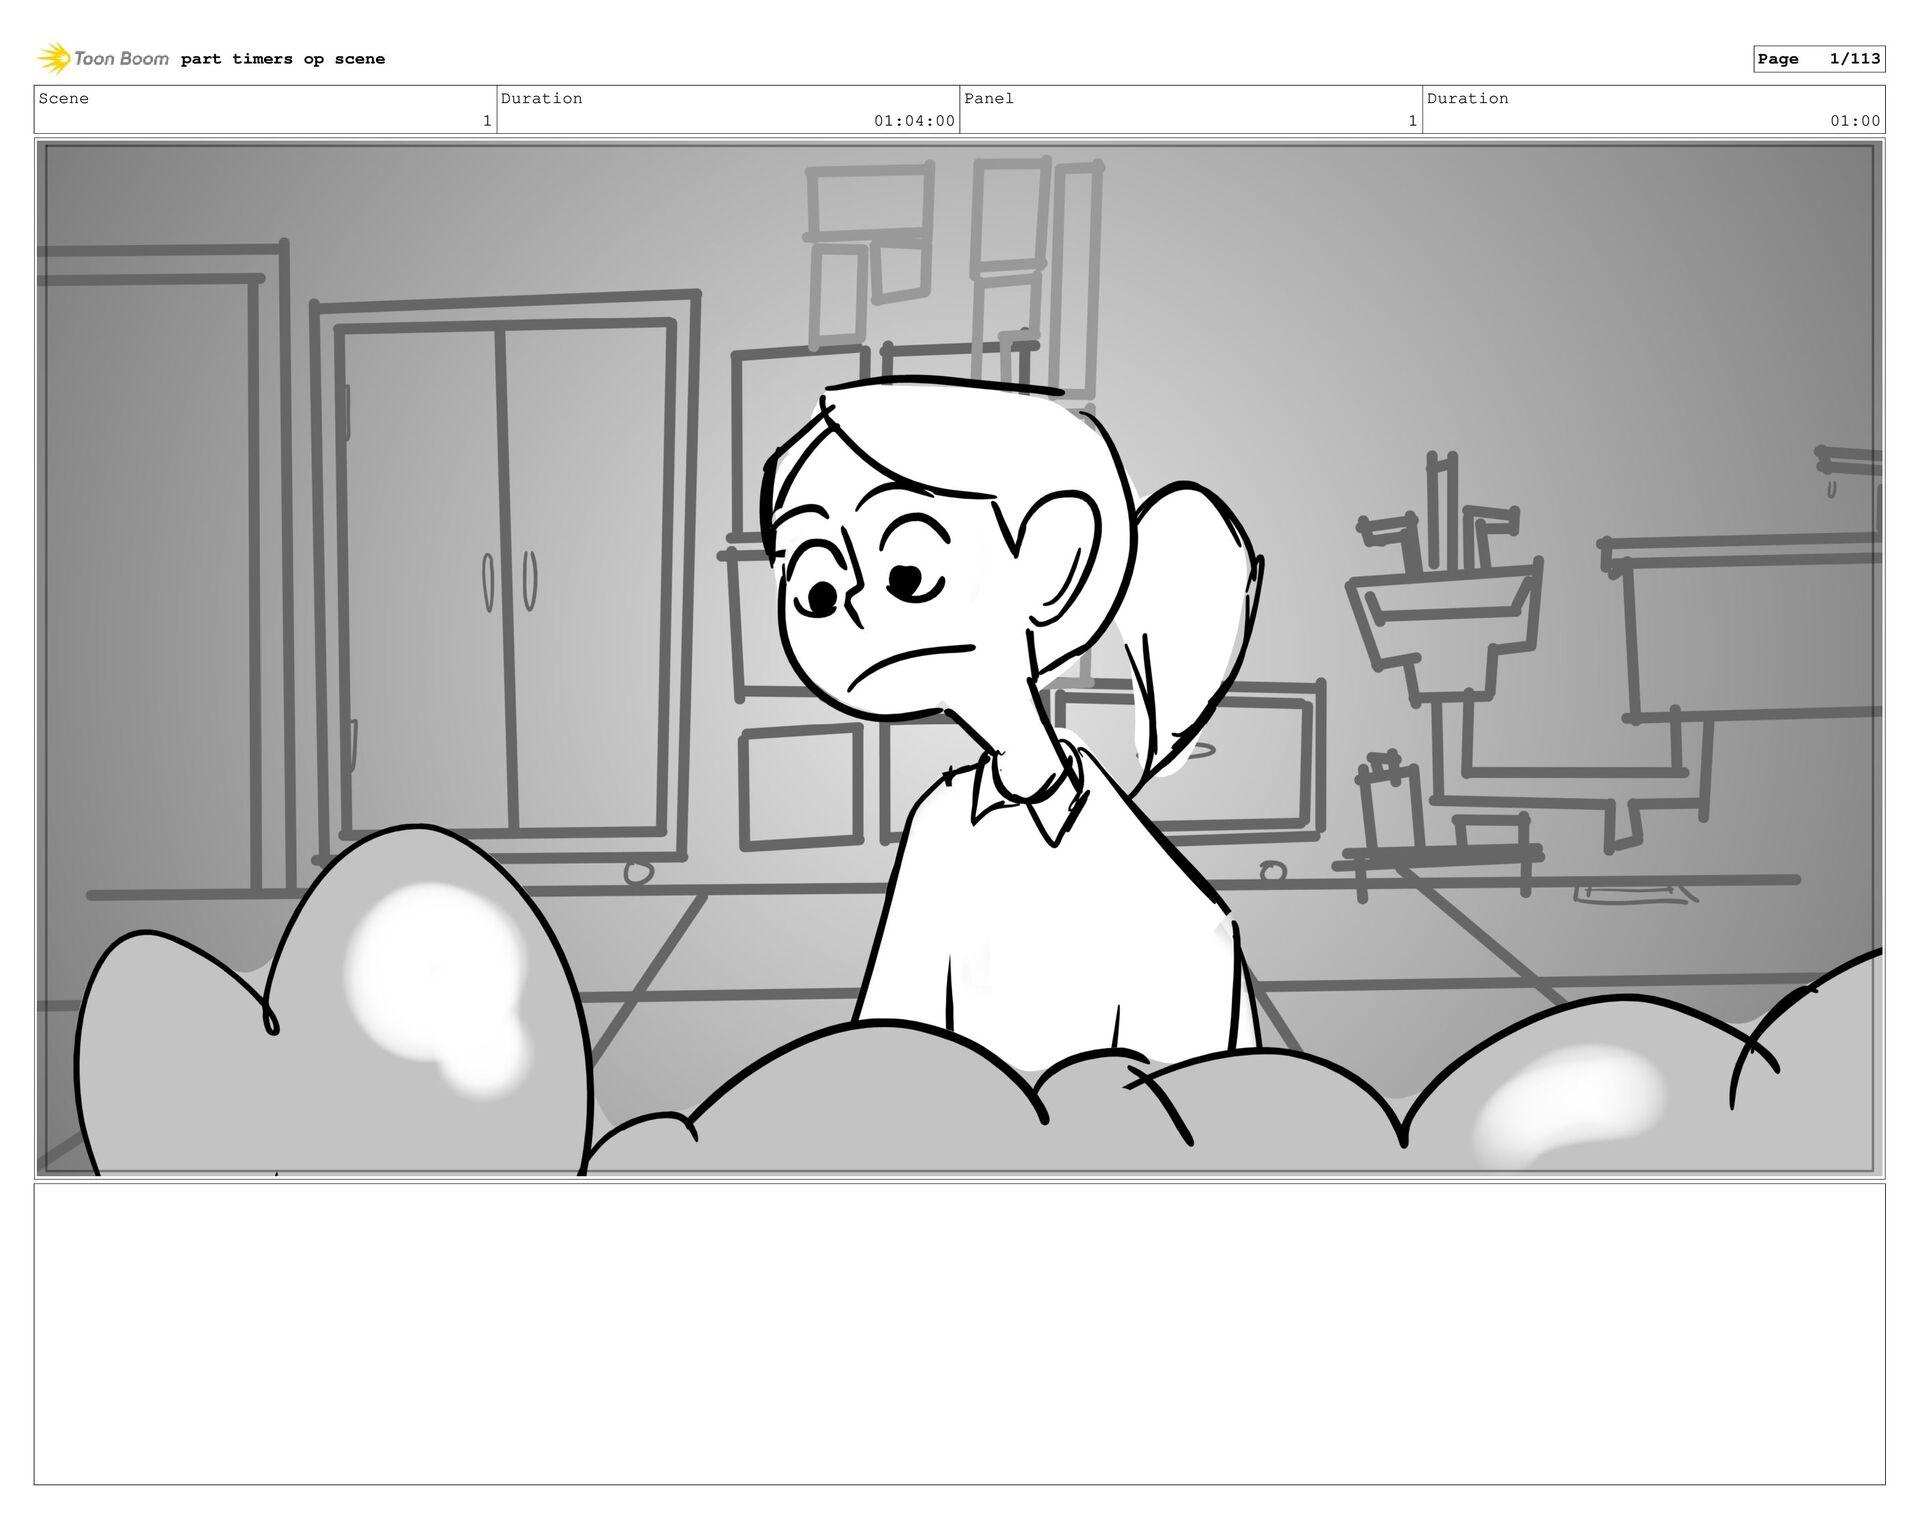 part timers op scene